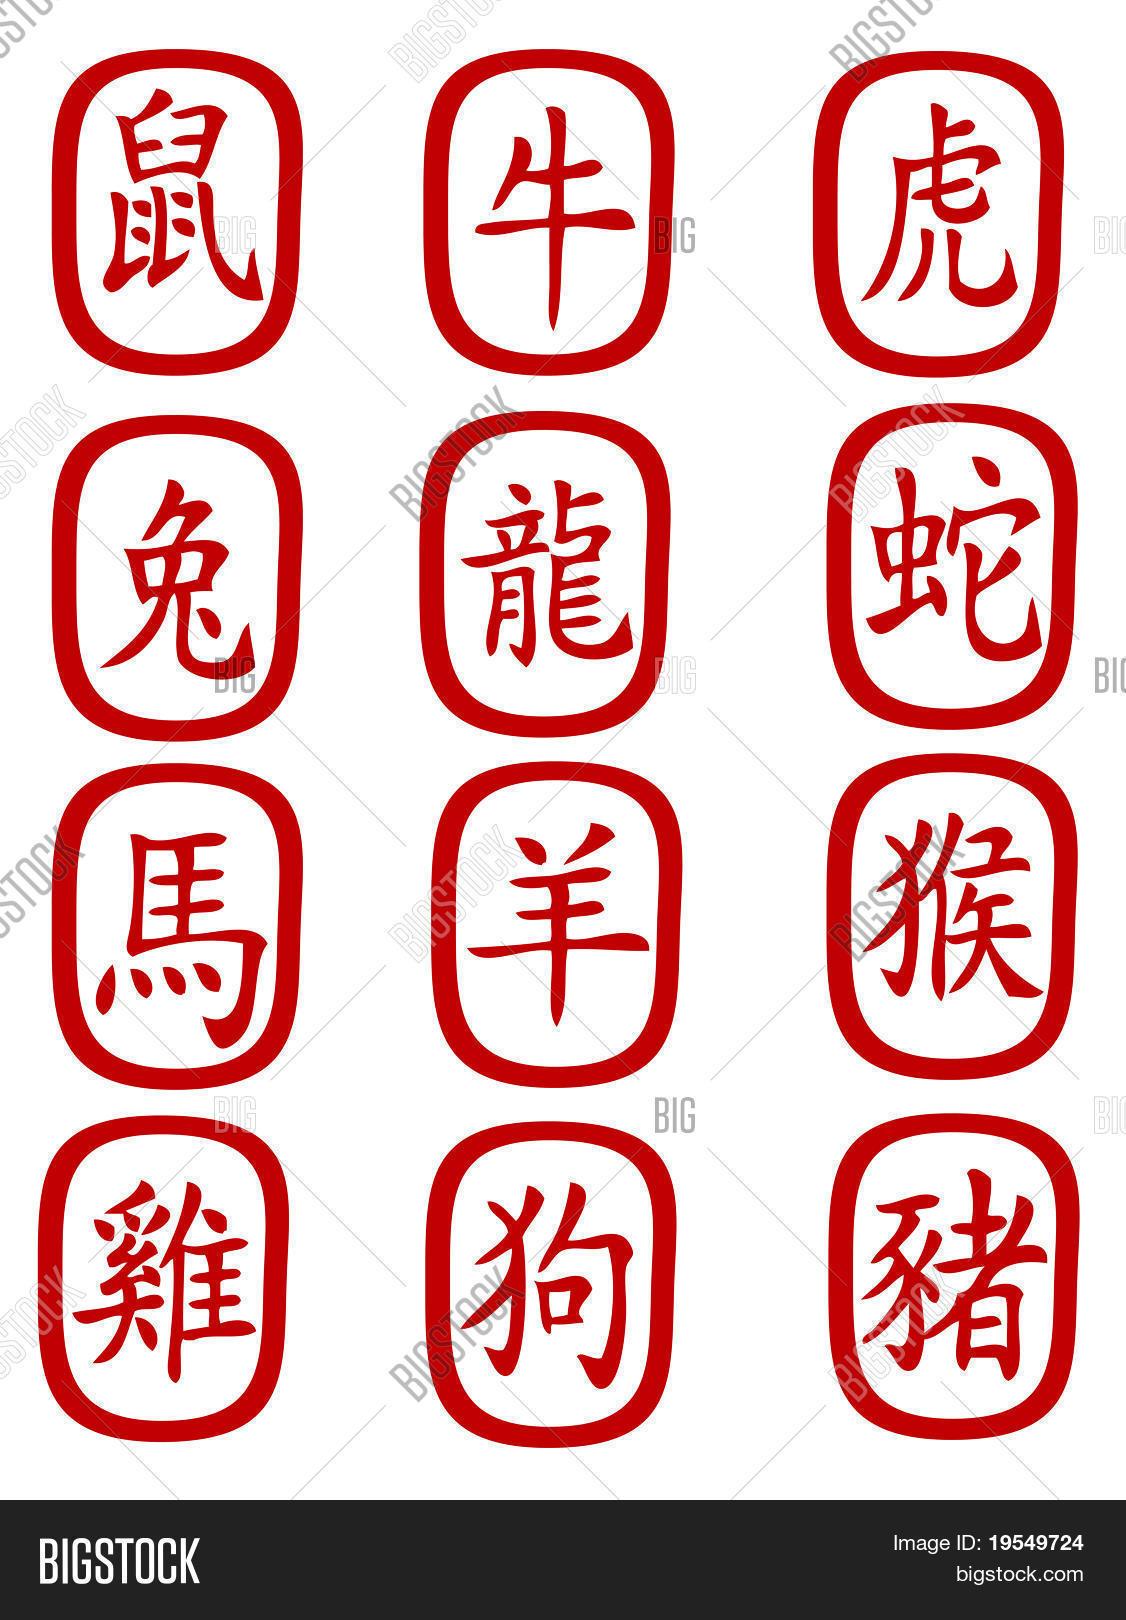 Chinese Zodiac Symbols Image Photo Free Trial Bigstock